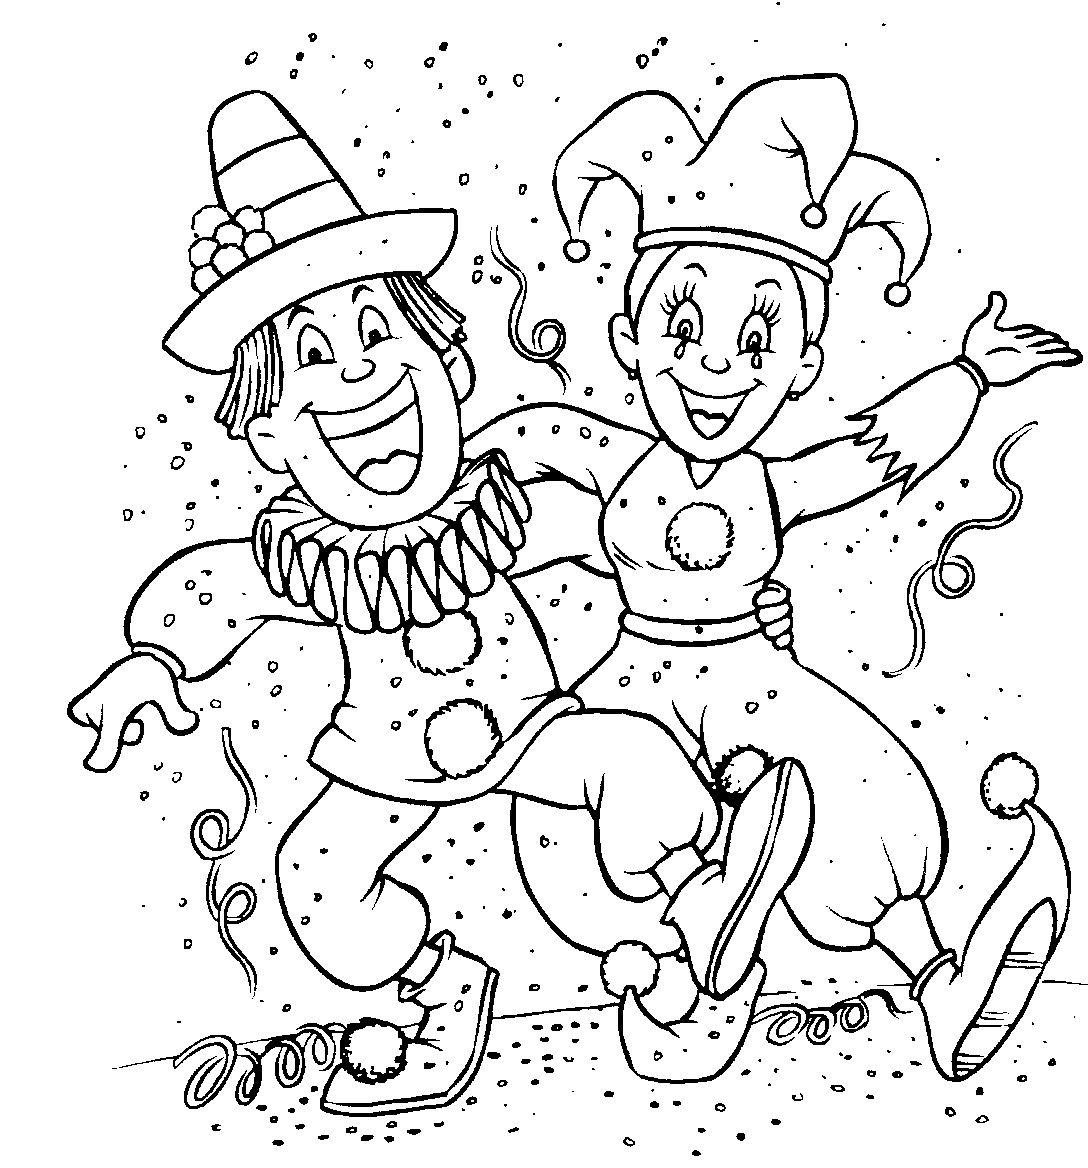 Desenho Carnaval Para Colorir Minuto Ligadominuto Ligado